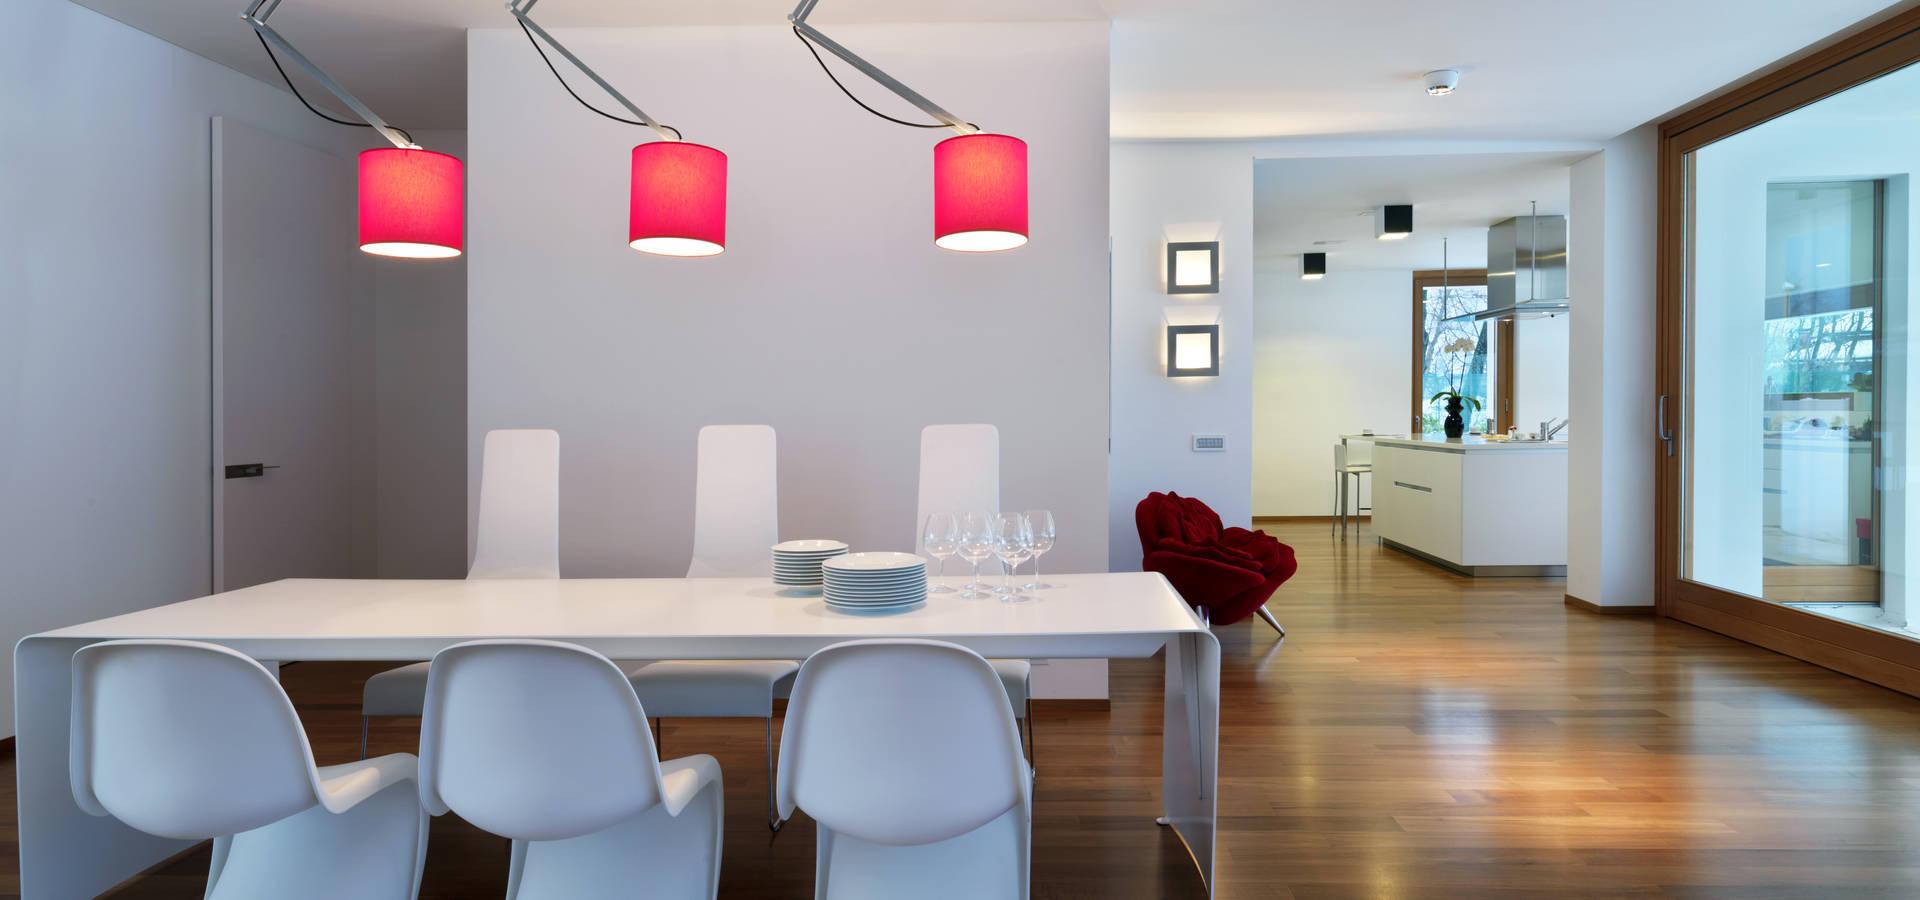 Horizontal space por damilano studio architects homify - Residence horizontal space damilano studio ...